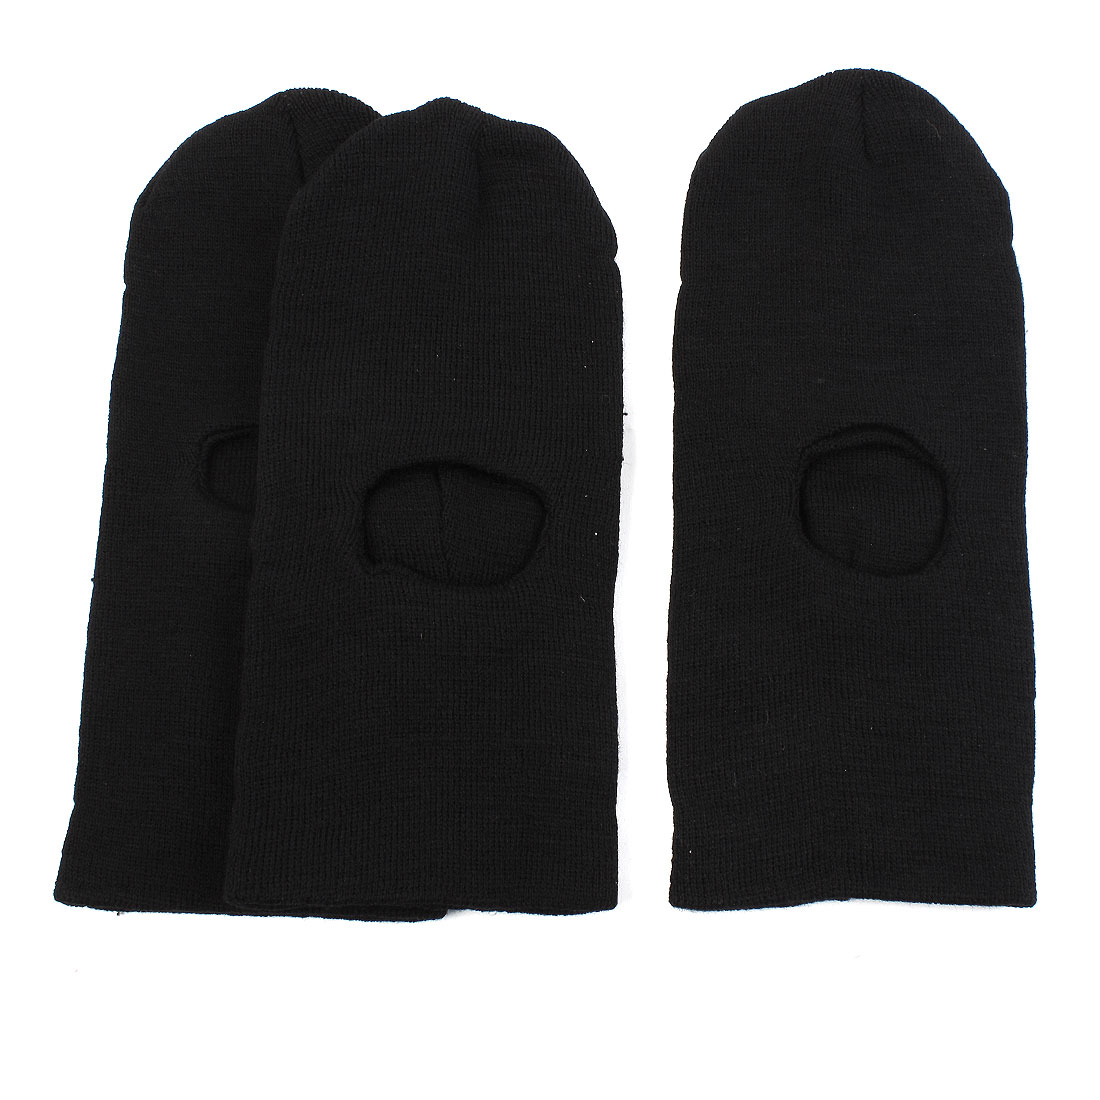 Elastic Knitted Cap Face Head Warmer Balaclava Hat Tactical Swat Police Mask Black 3PCS